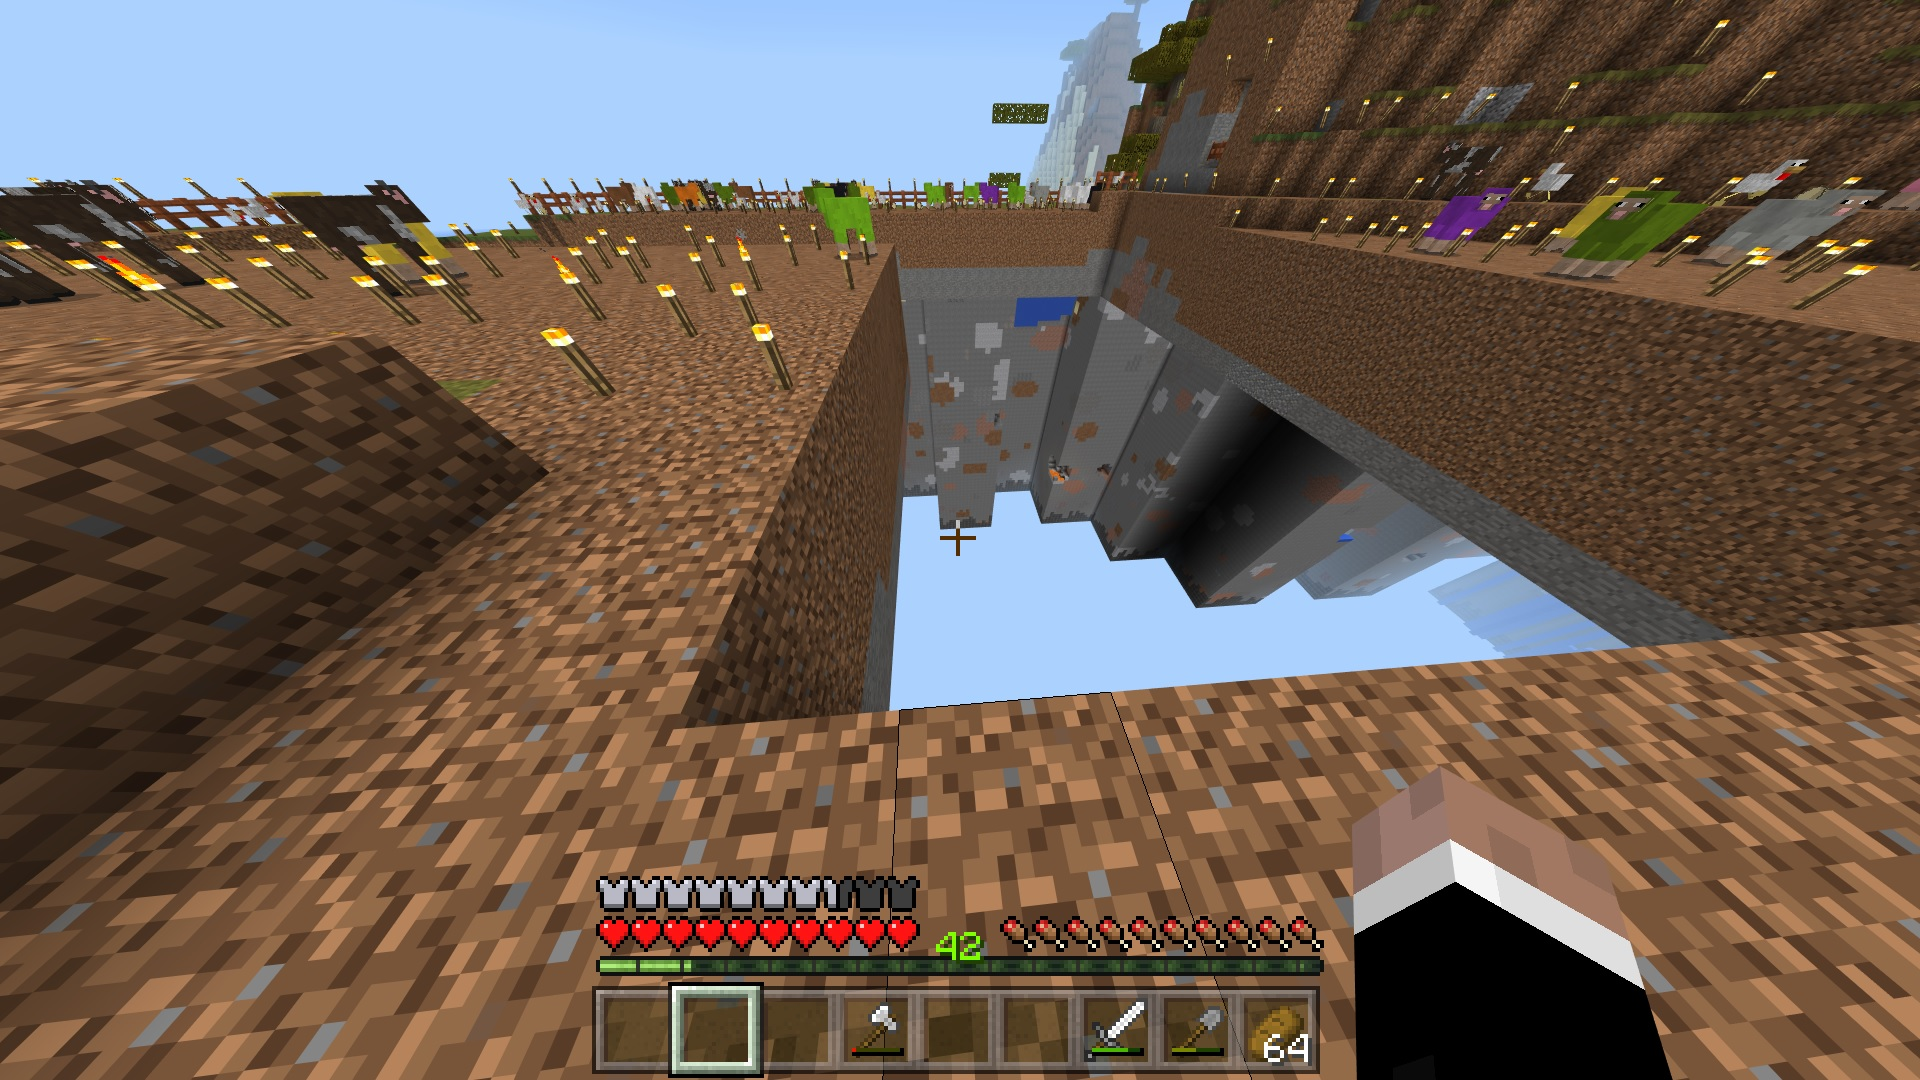 REALMS-494] Huge Chunks of World disappearing! - Jira